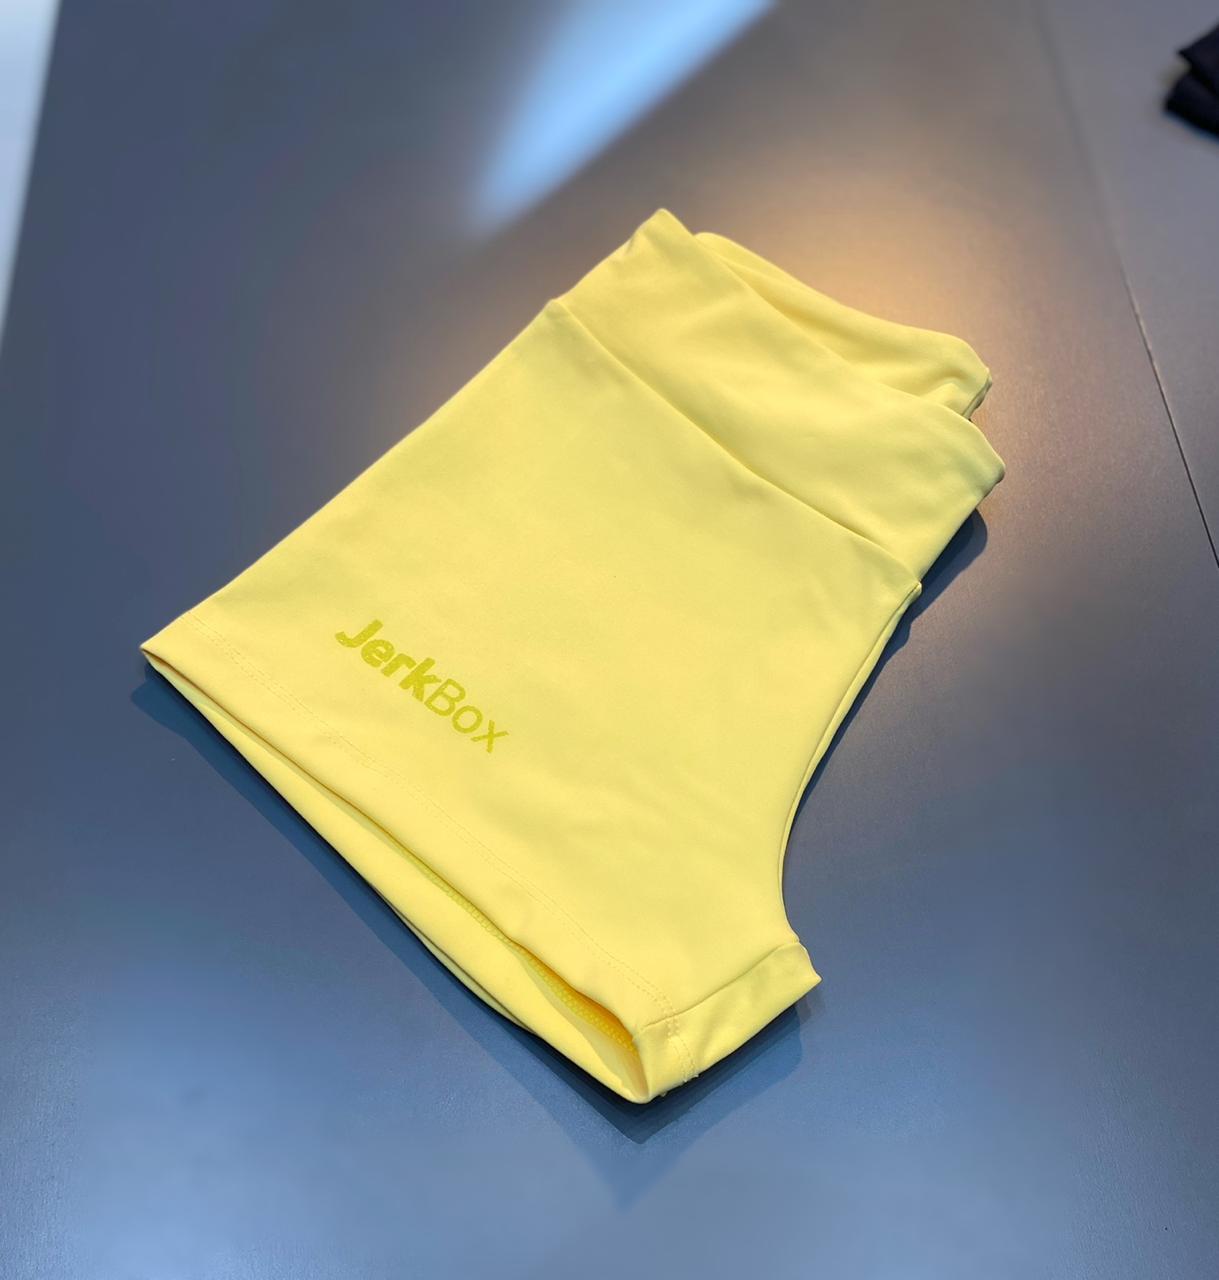 Short RX Amarelo Candy Color